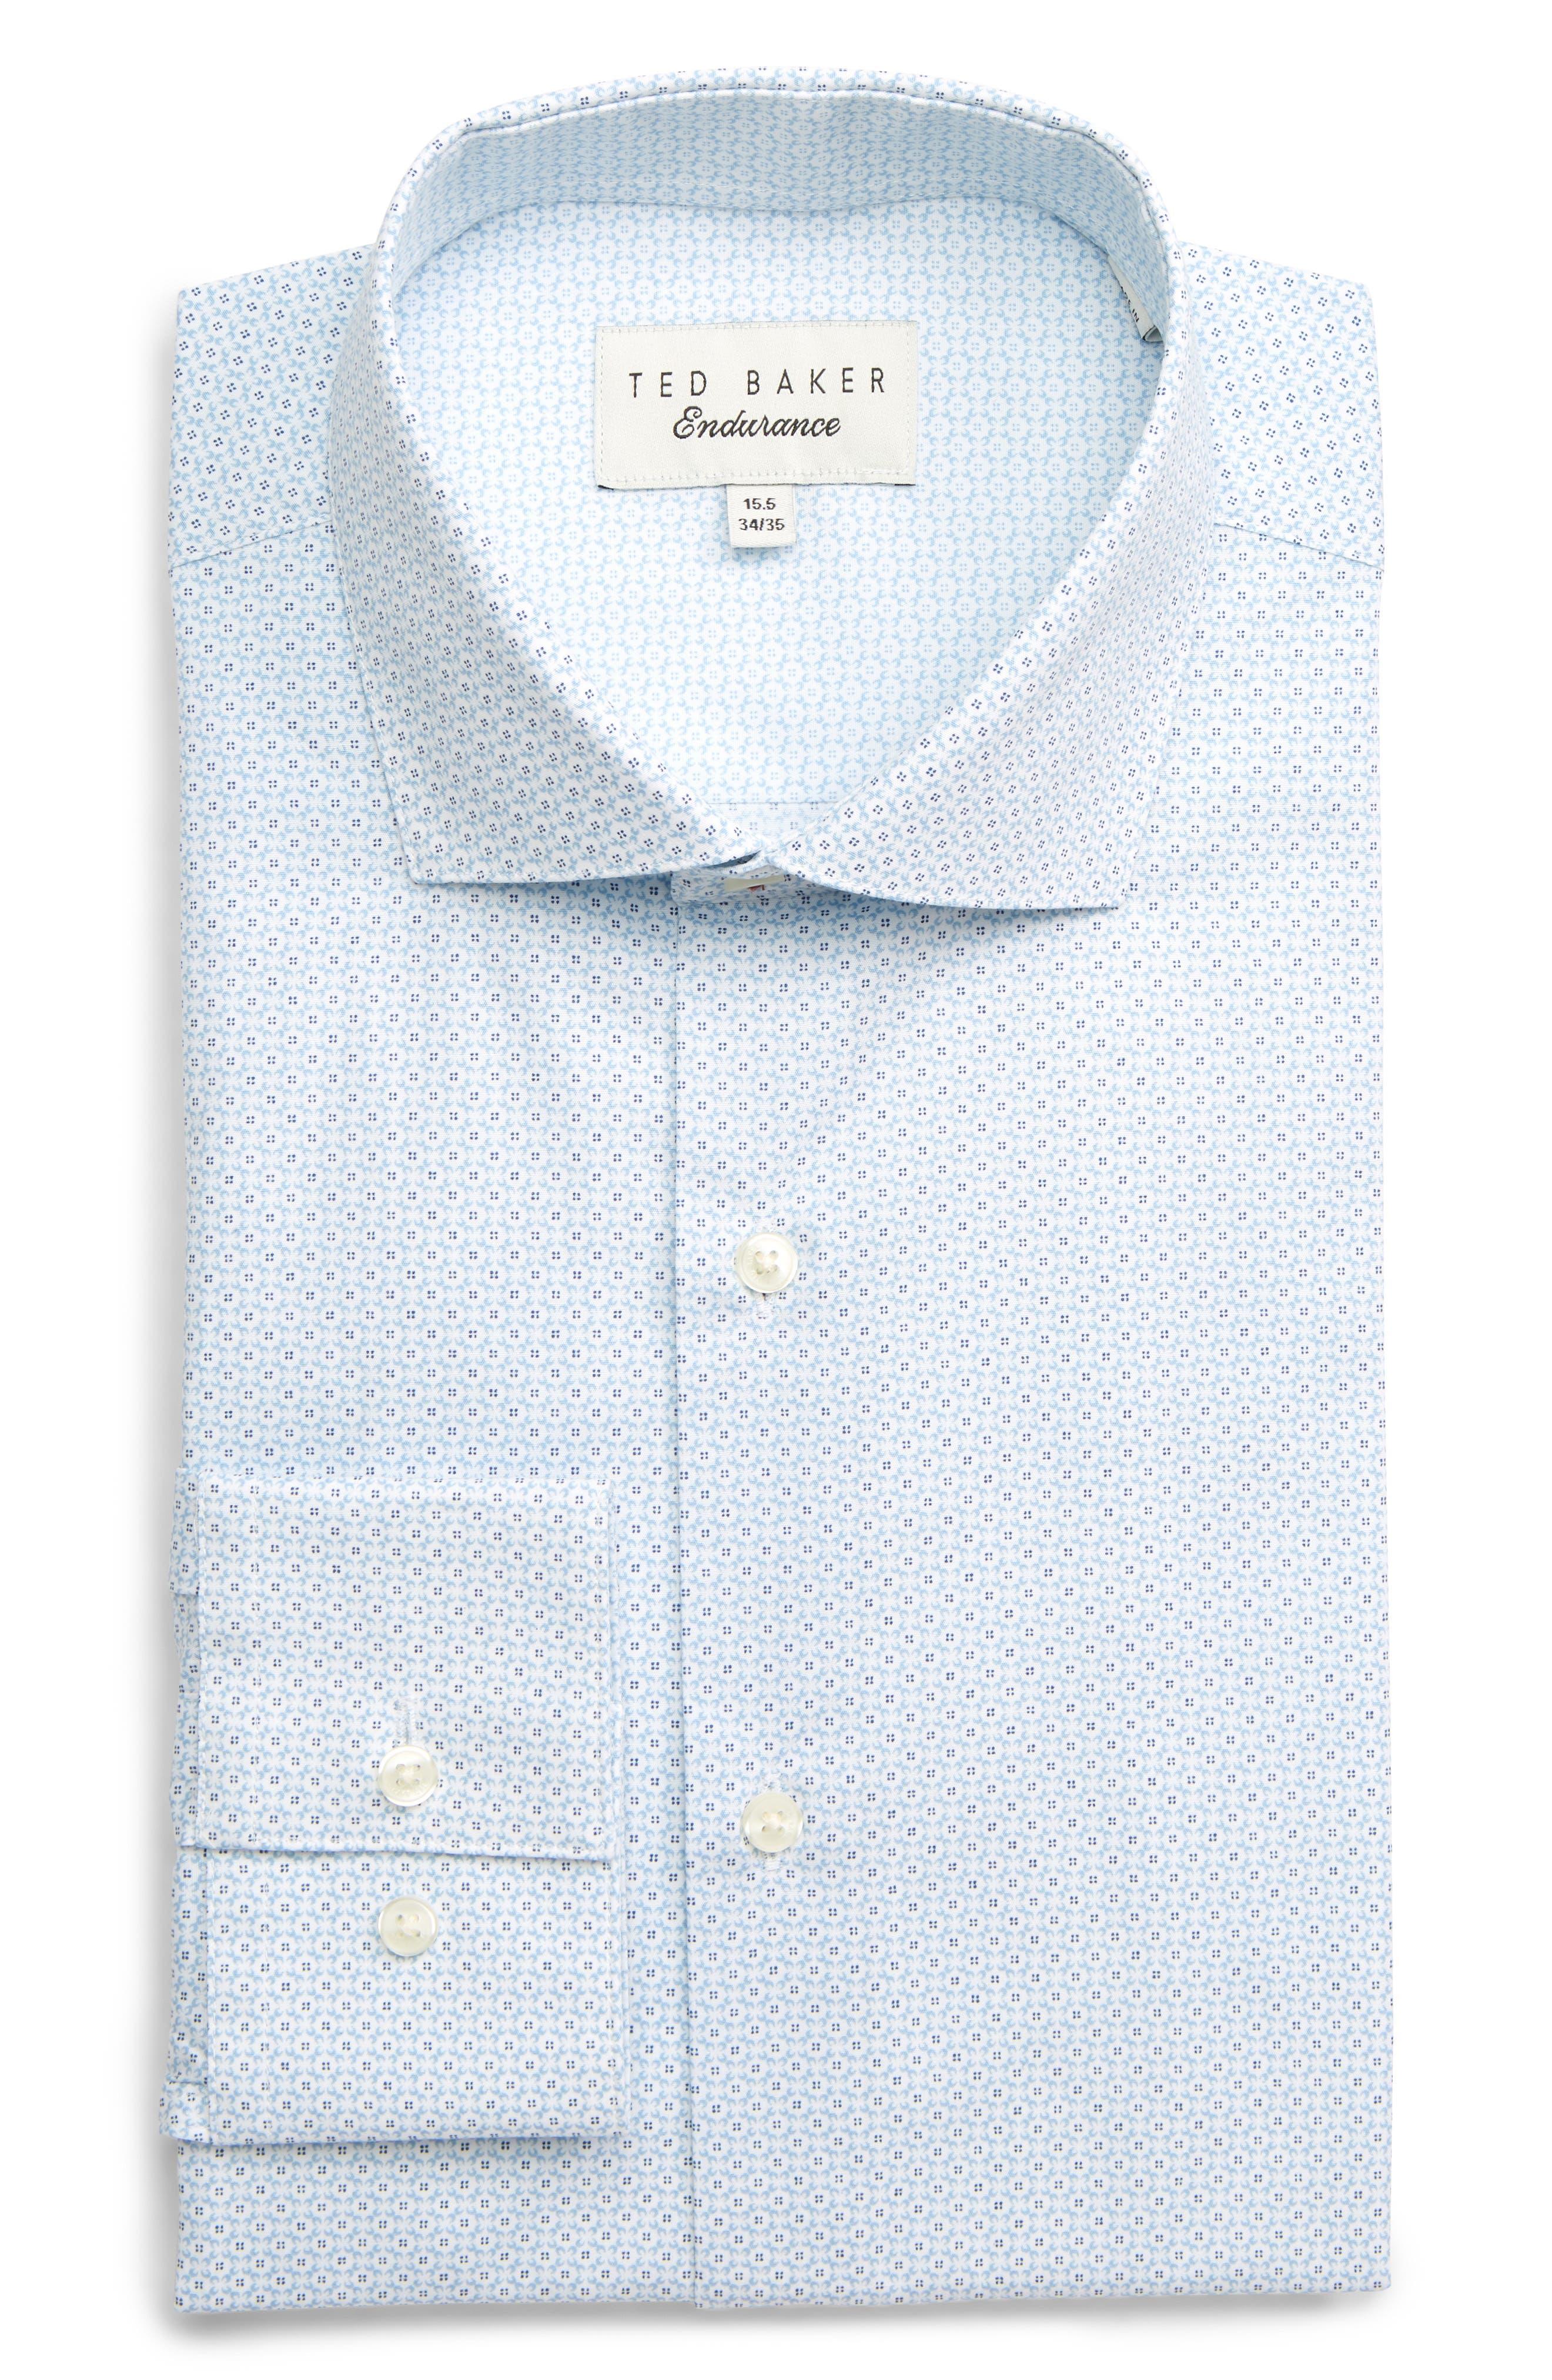 TED BAKER LONDON, Endurance Wobego Slim Fit Geometric Dress Shirt, Main thumbnail 1, color, BLUE